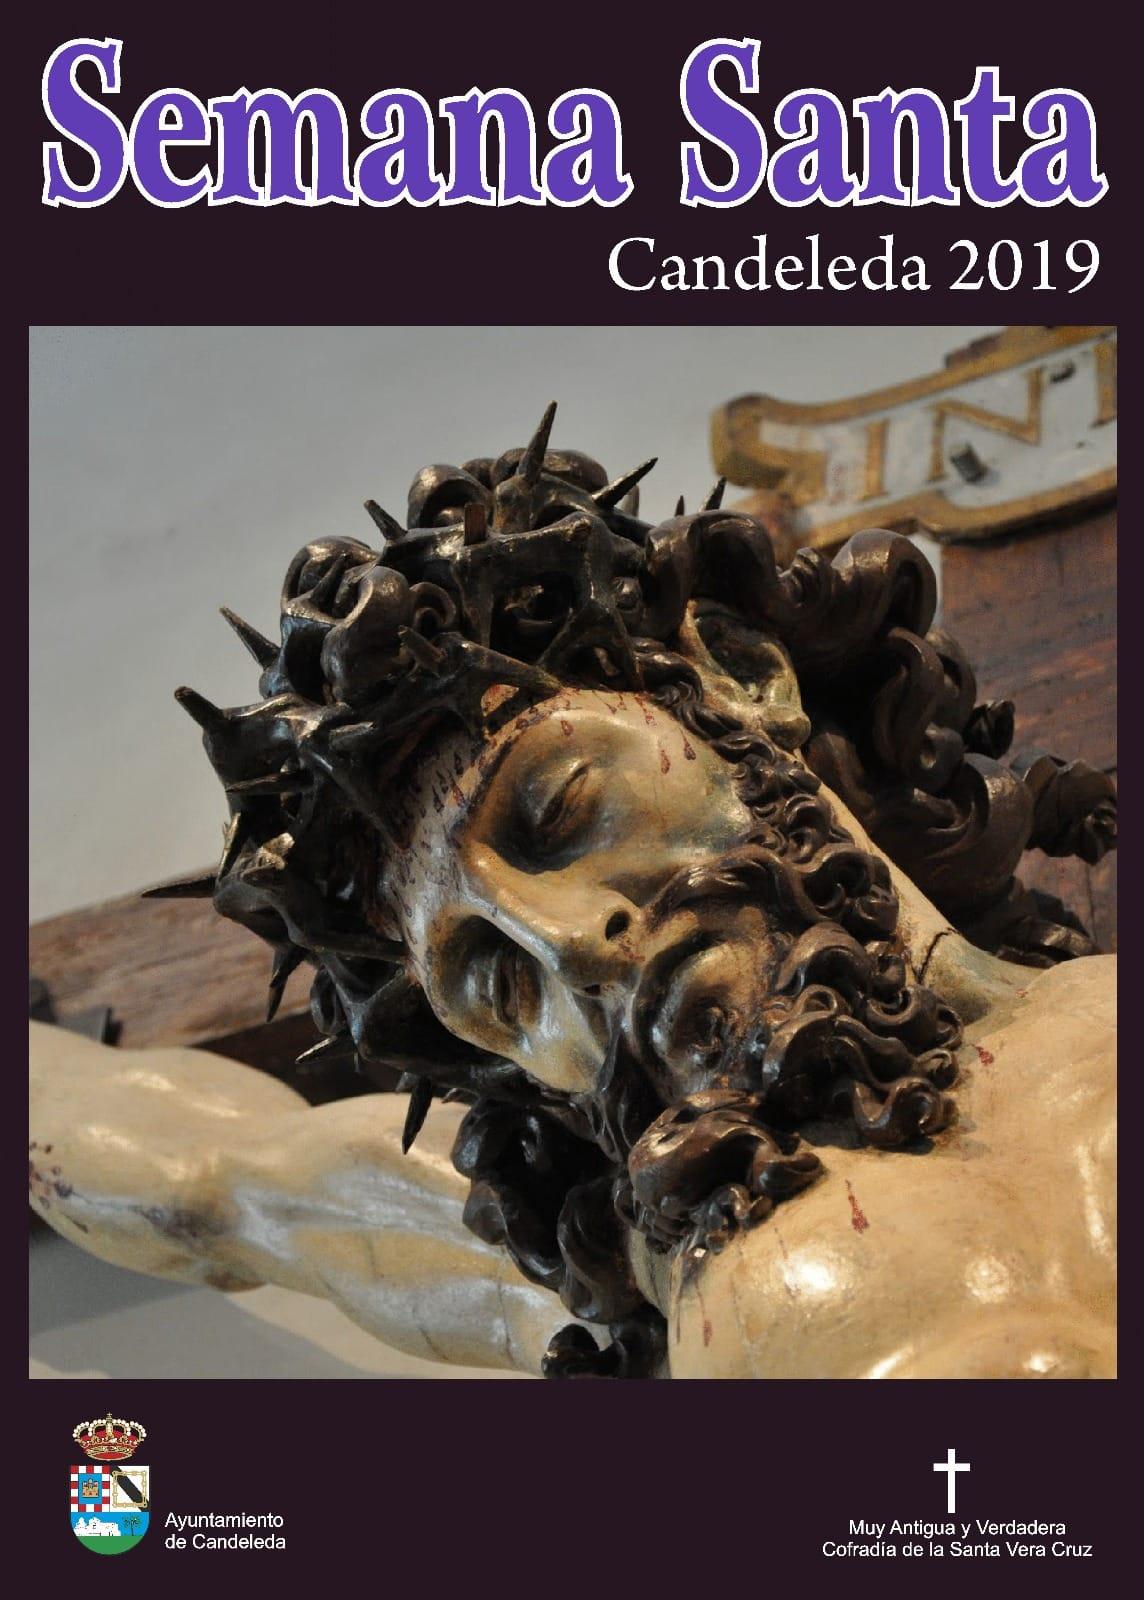 Semana Santa 2019 - Candeleda - TiétarTeVe